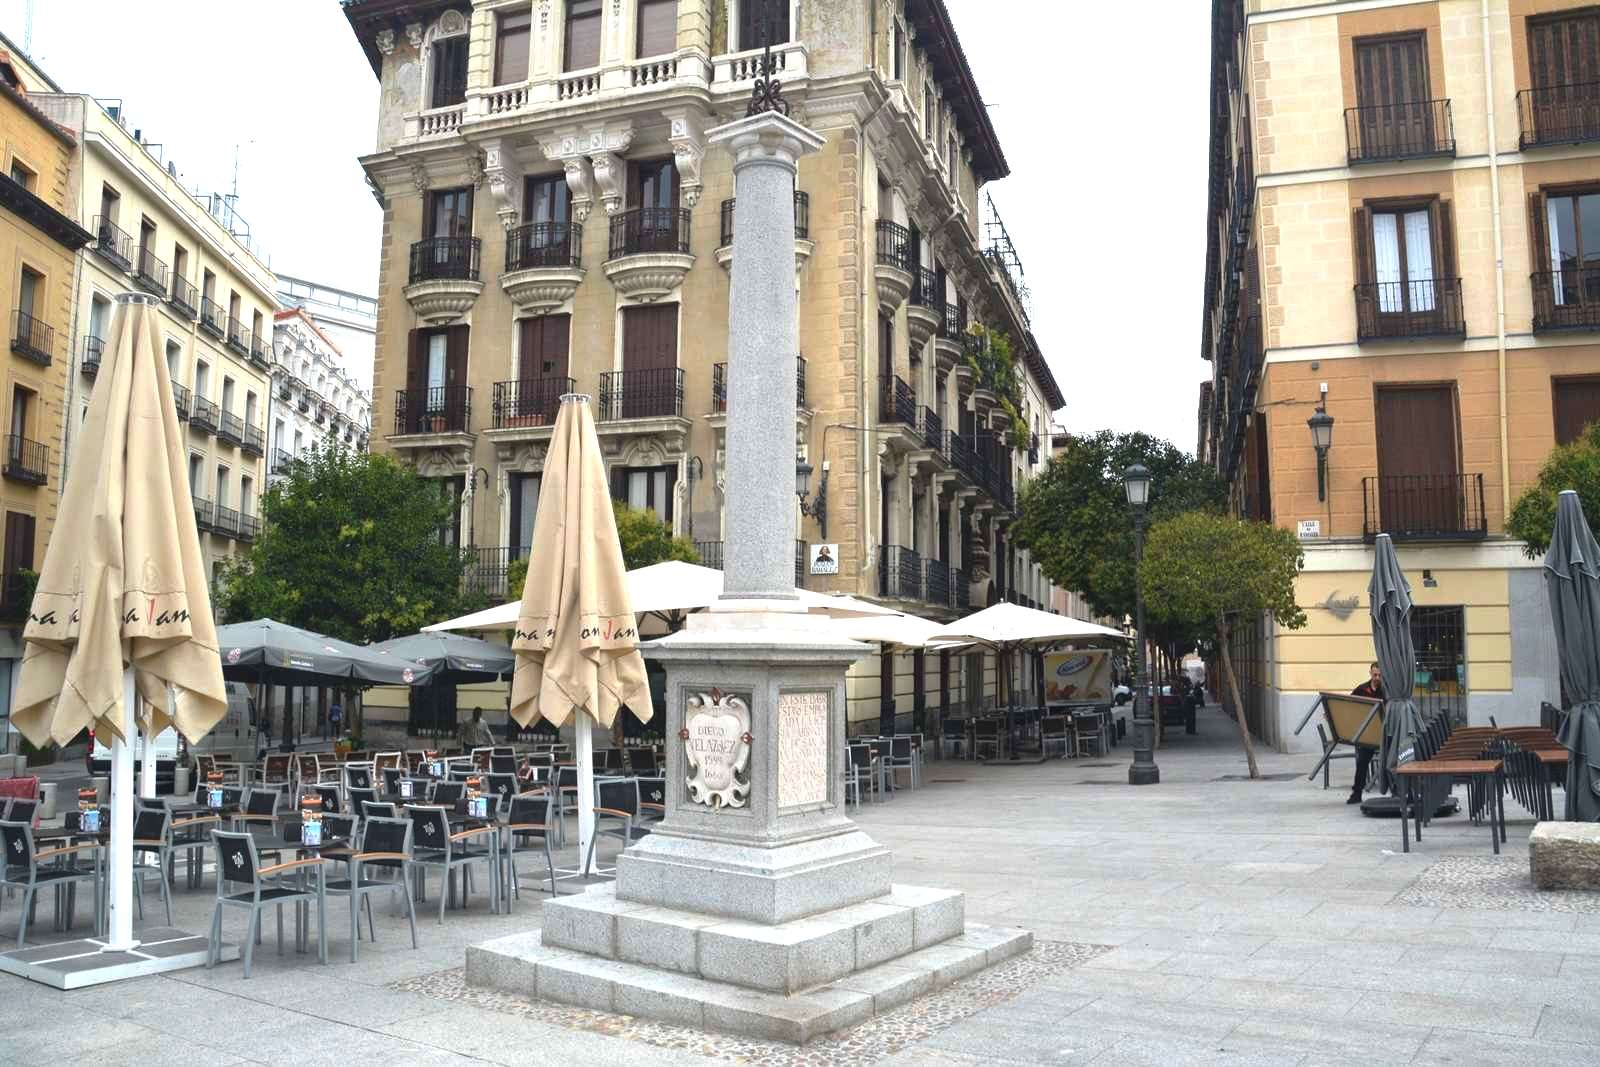 Plaza-de-Ramales-11